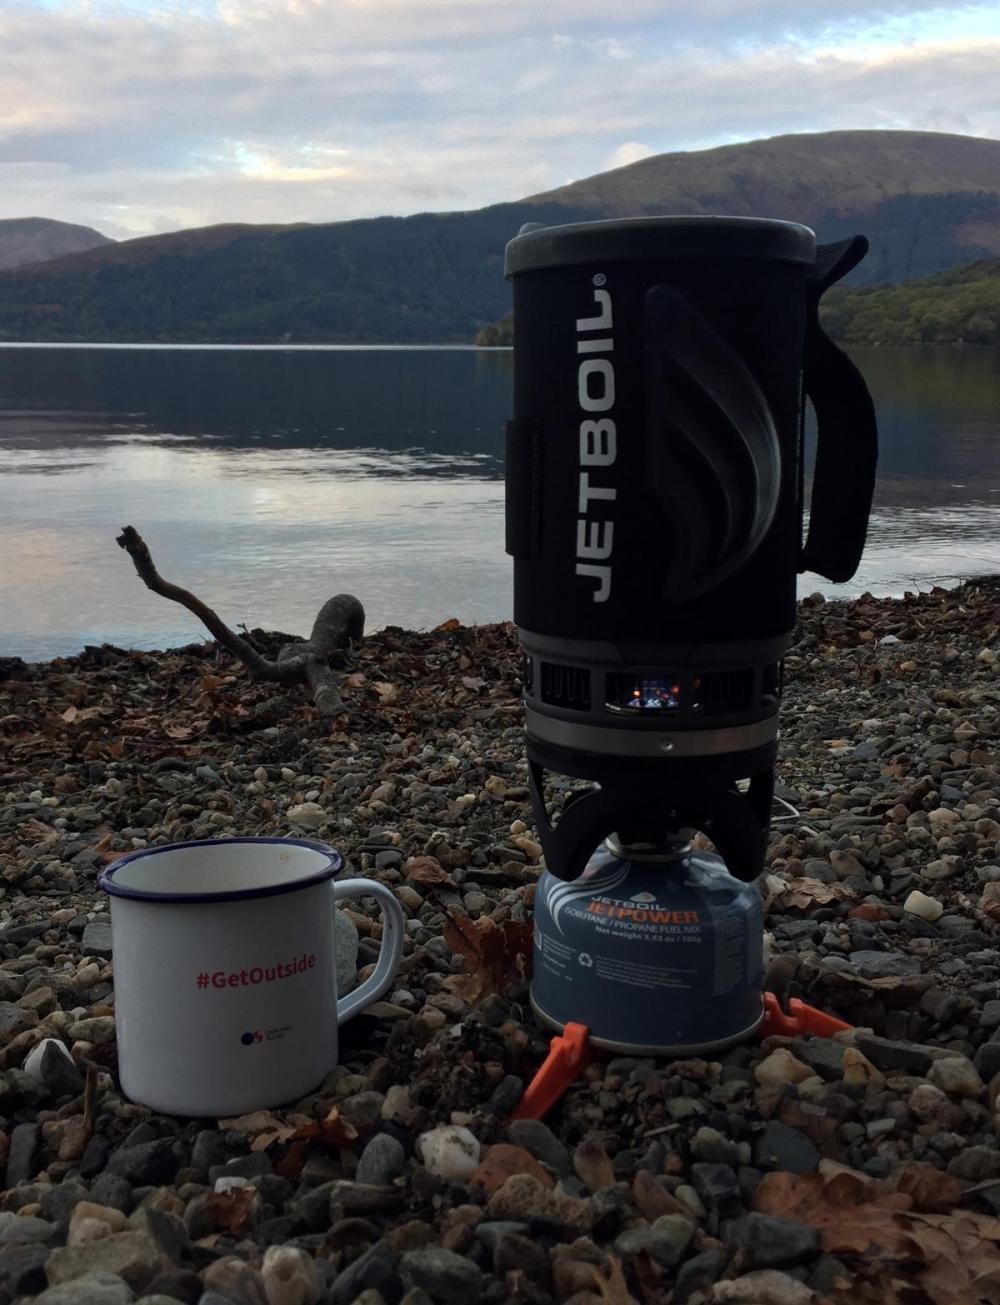 Splodz Blogz | Jetboil Flash on the West Highland Way